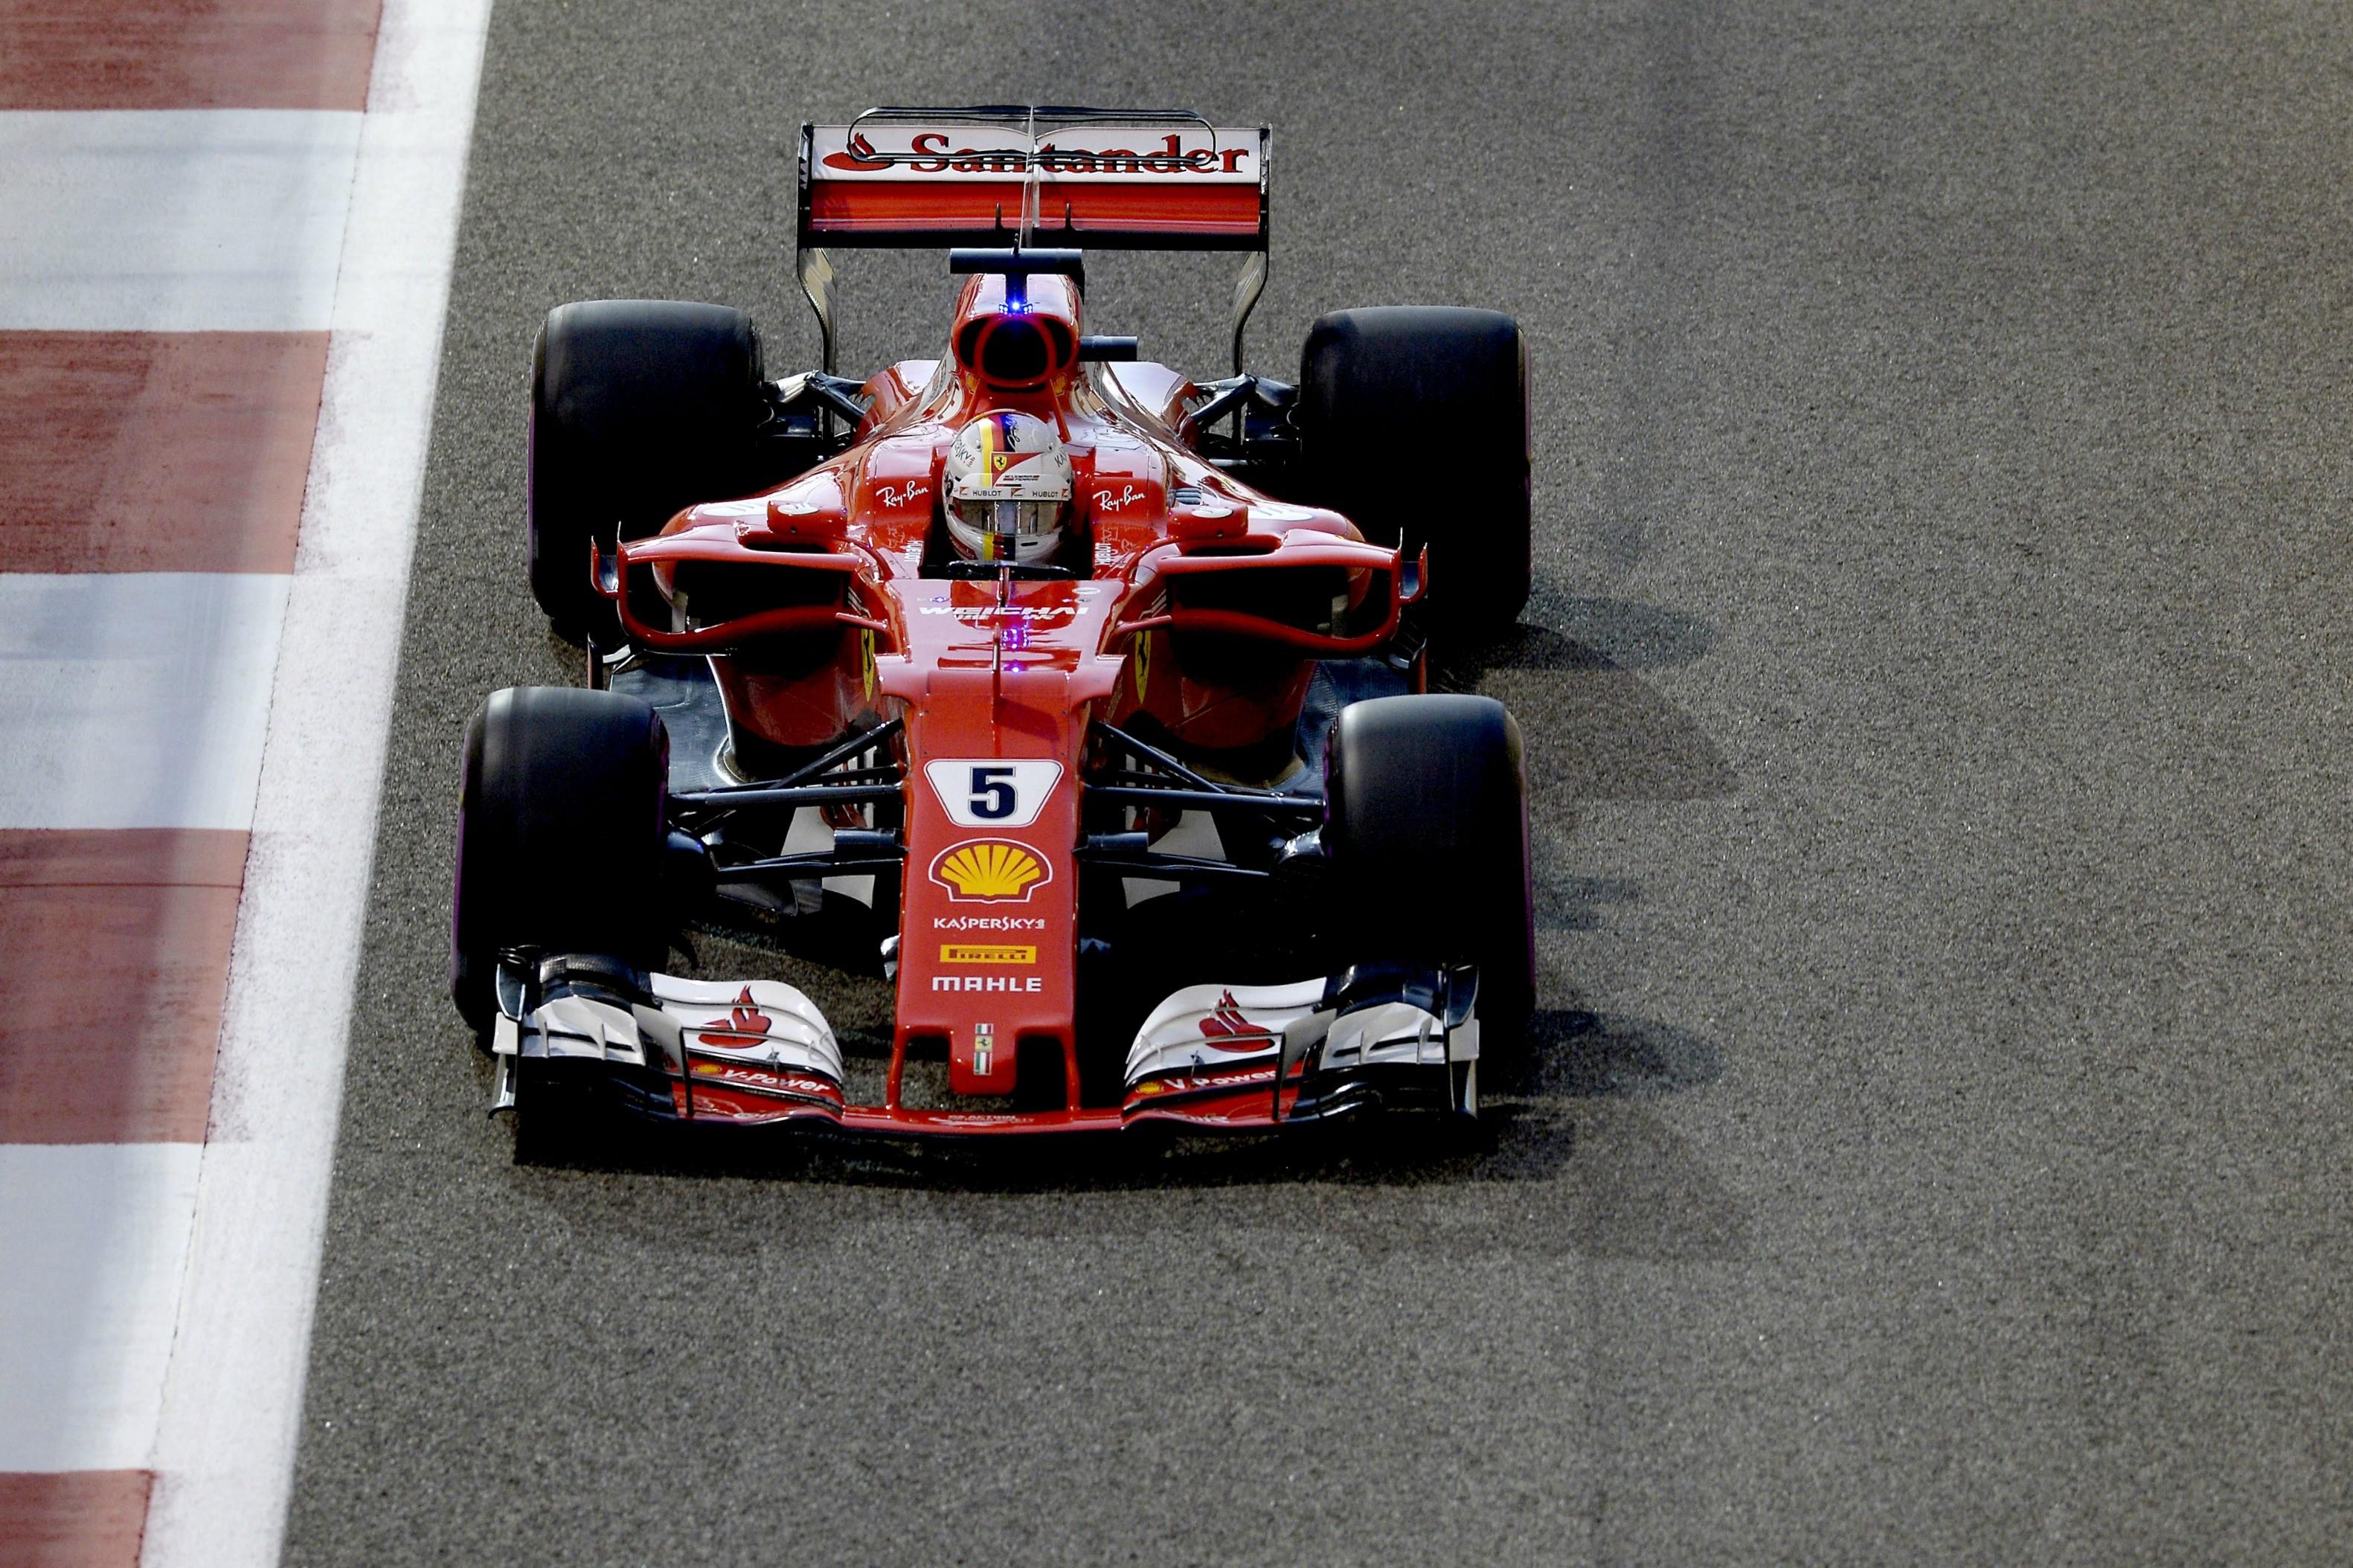 Sebastian Vettel (Ferrari) au Grand Prix d'Abou Dabi 2017